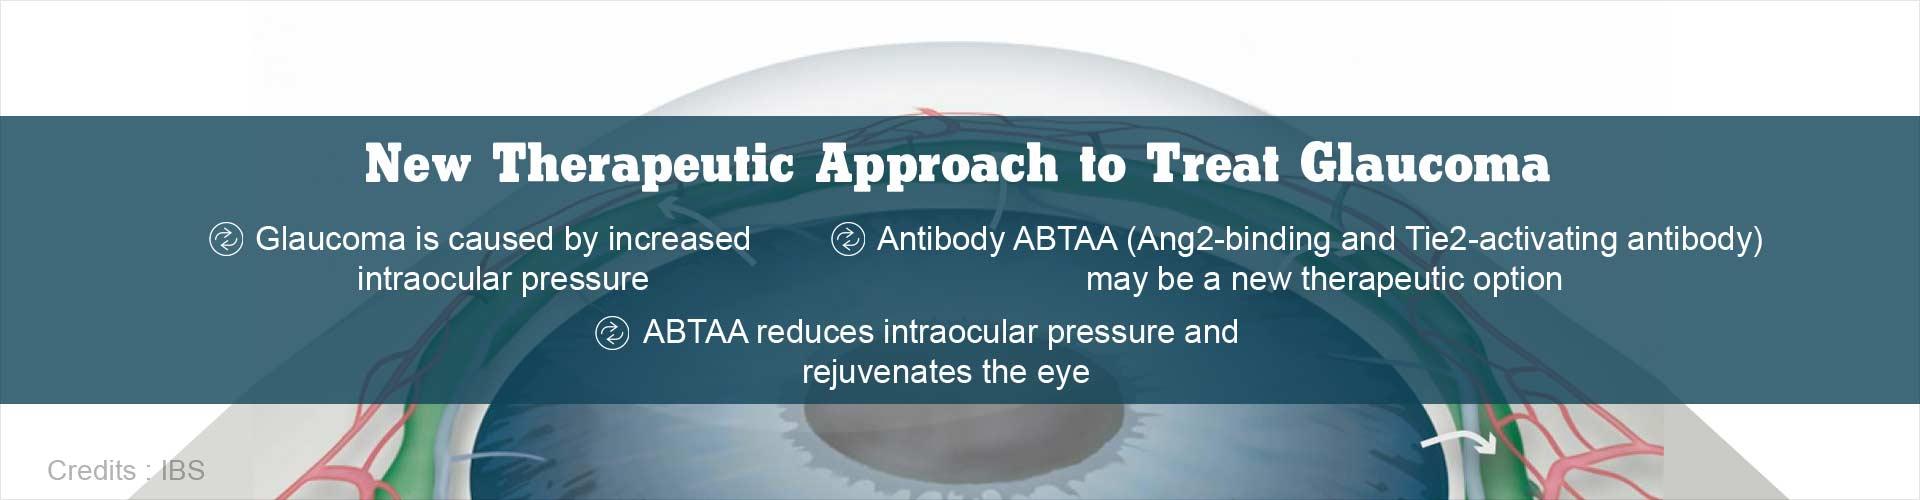 Glaucoma: Antibody Treatment may Reduce Intraocular Pressure